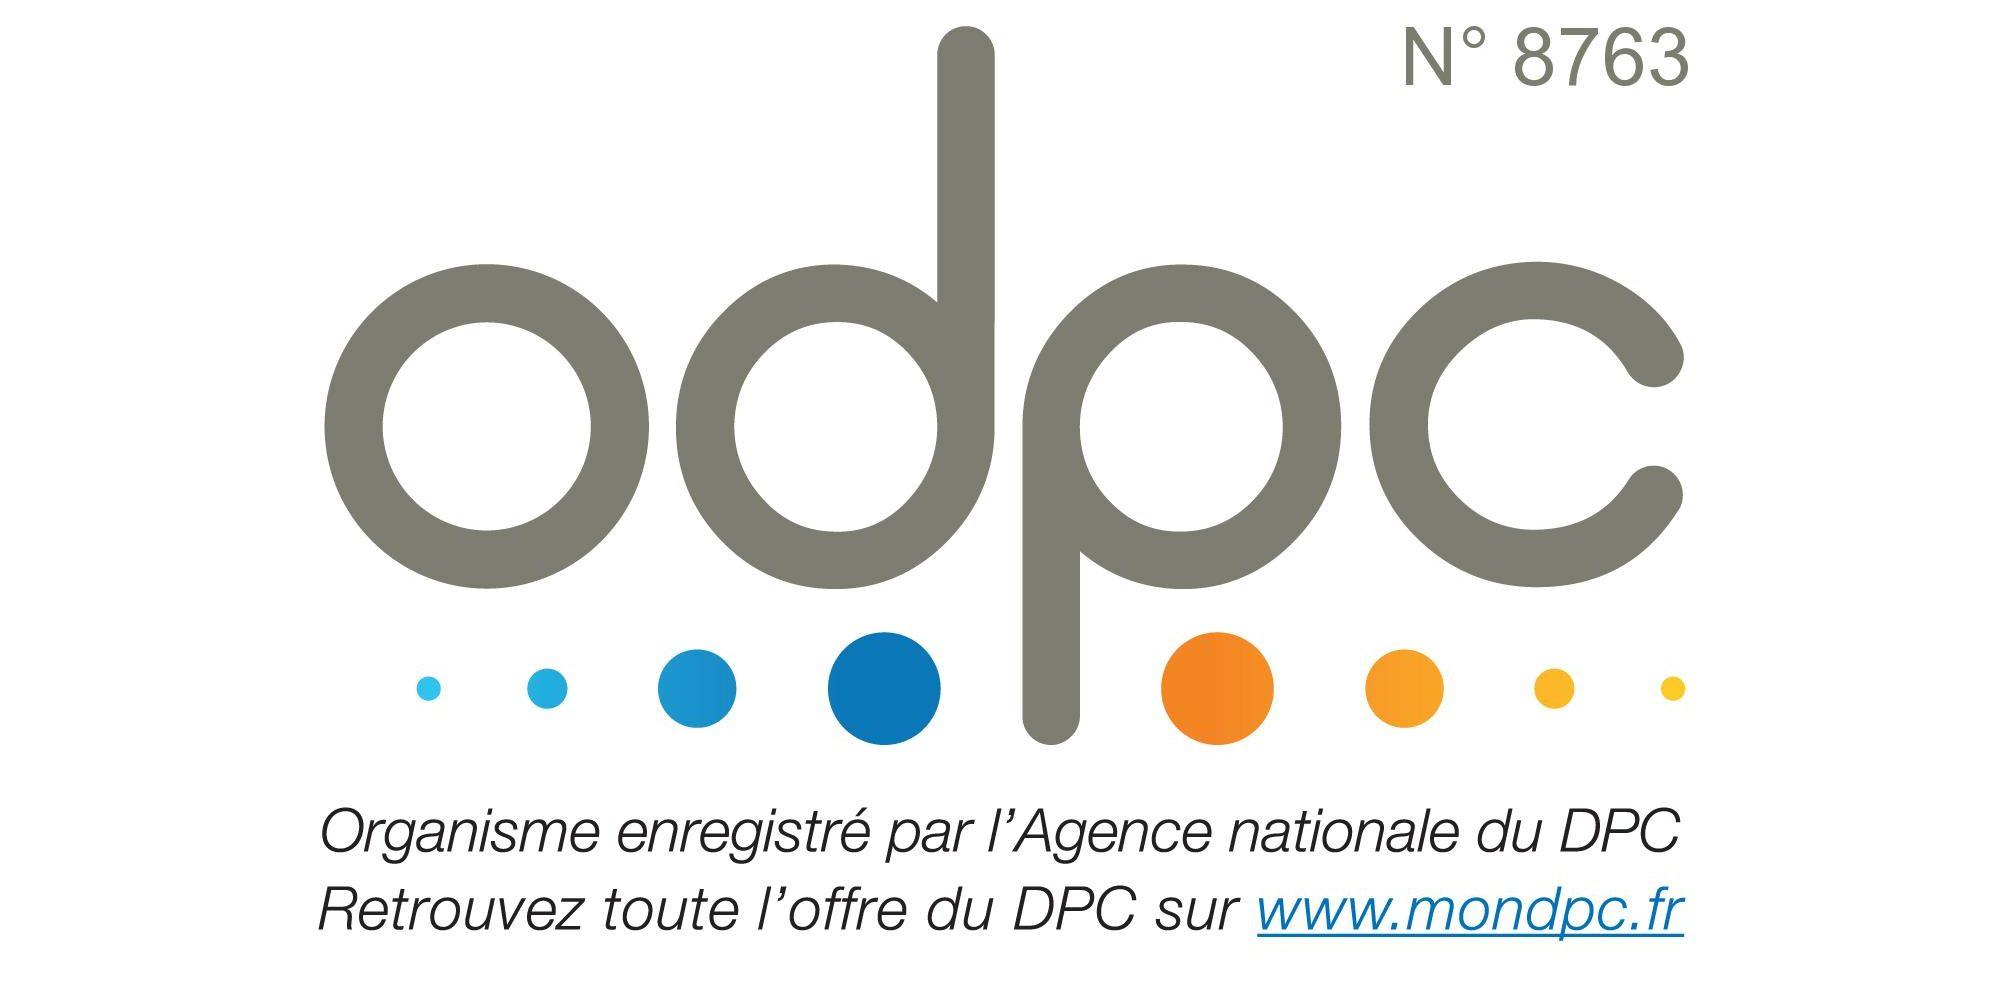 dpc - d u00e9veloppement professionnel continu - andpc